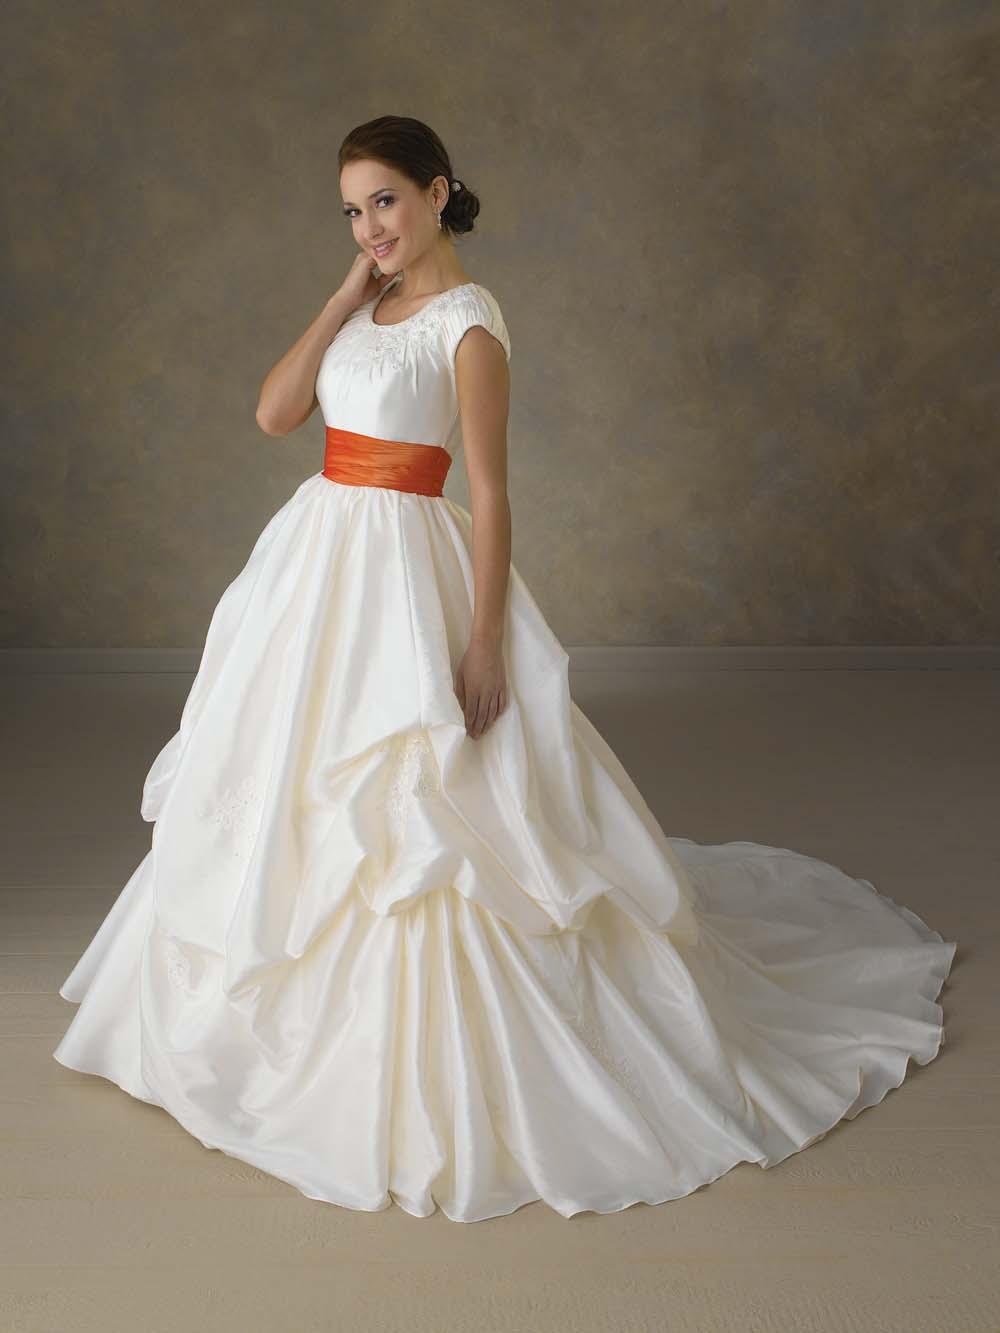 509975f9d1 Wedding Gown Giveaway on Bonny s Blog!